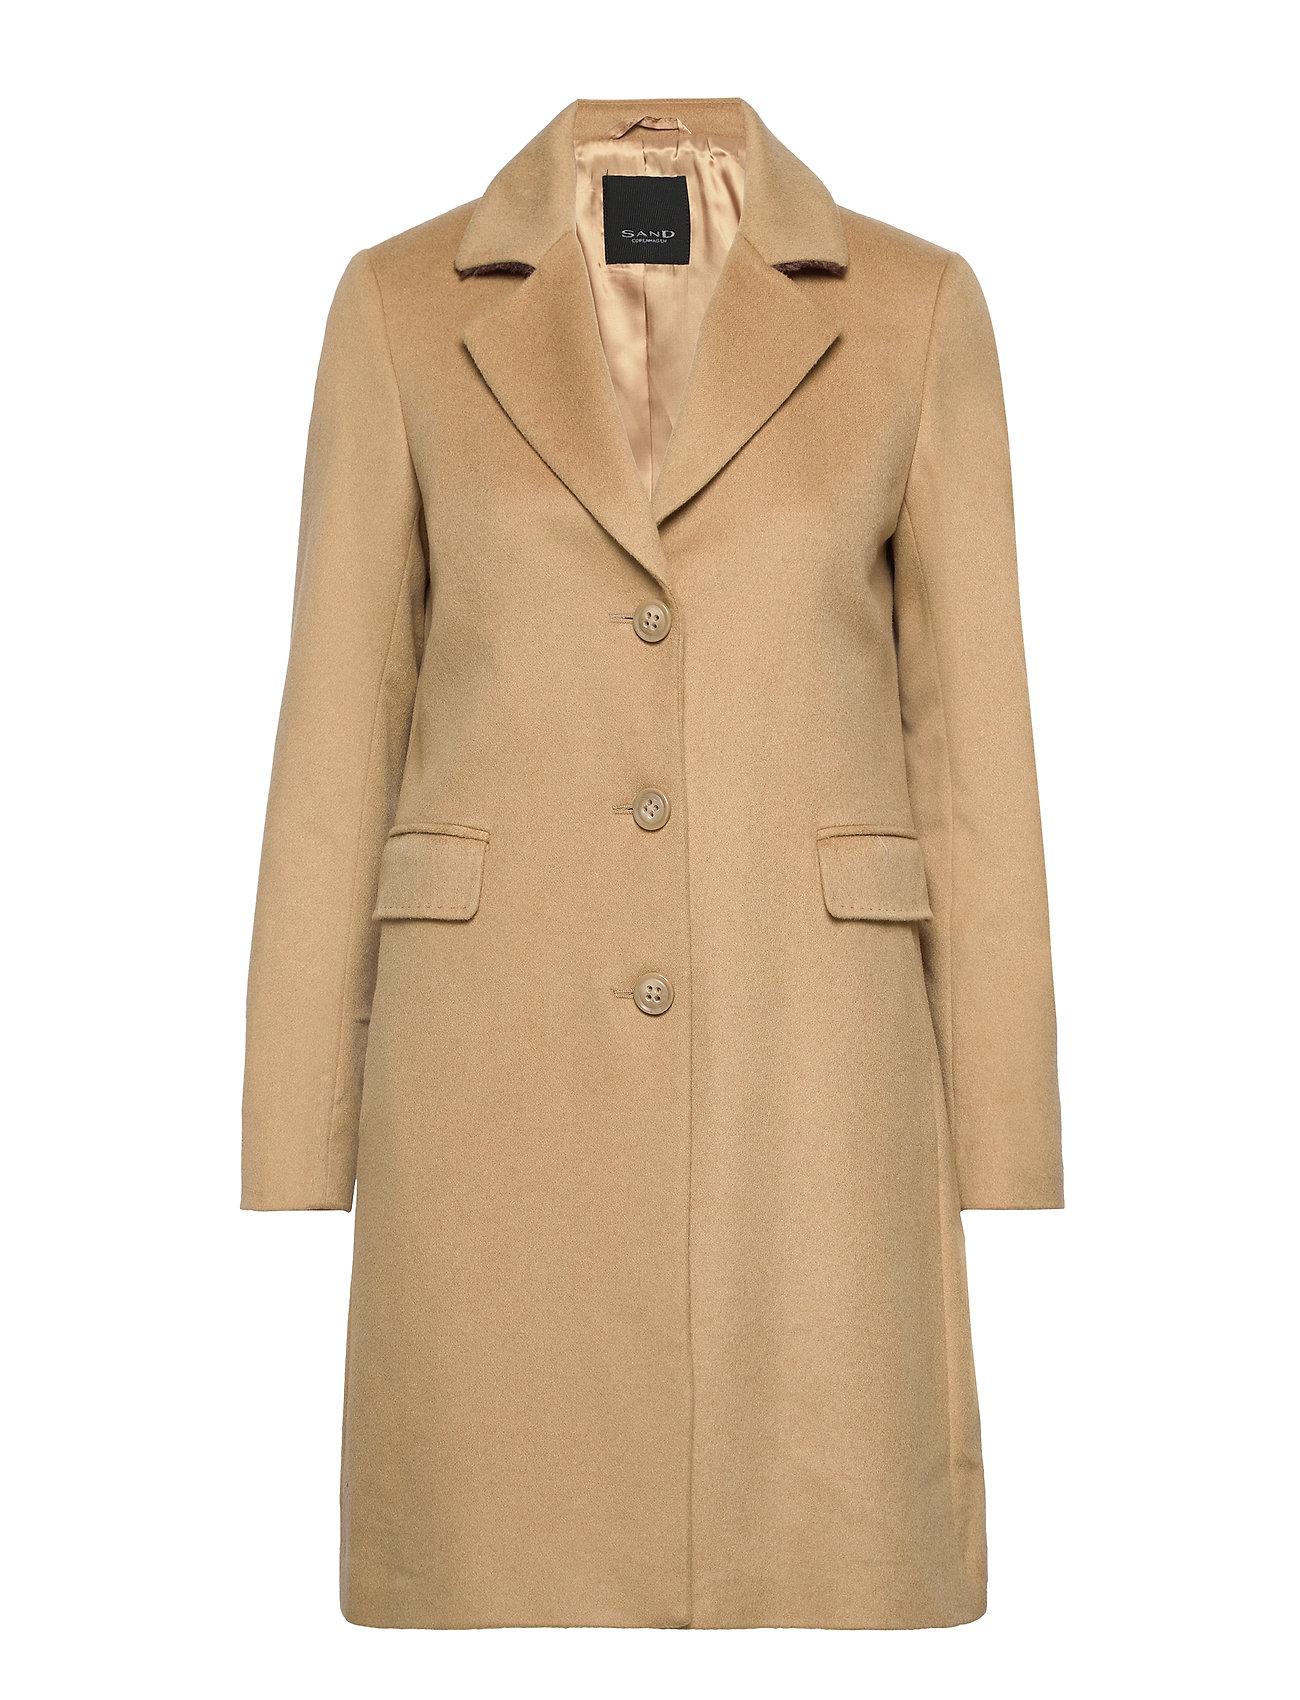 SAND Cashmere Coat WW - Britni 2 - LIGHT CAMEL